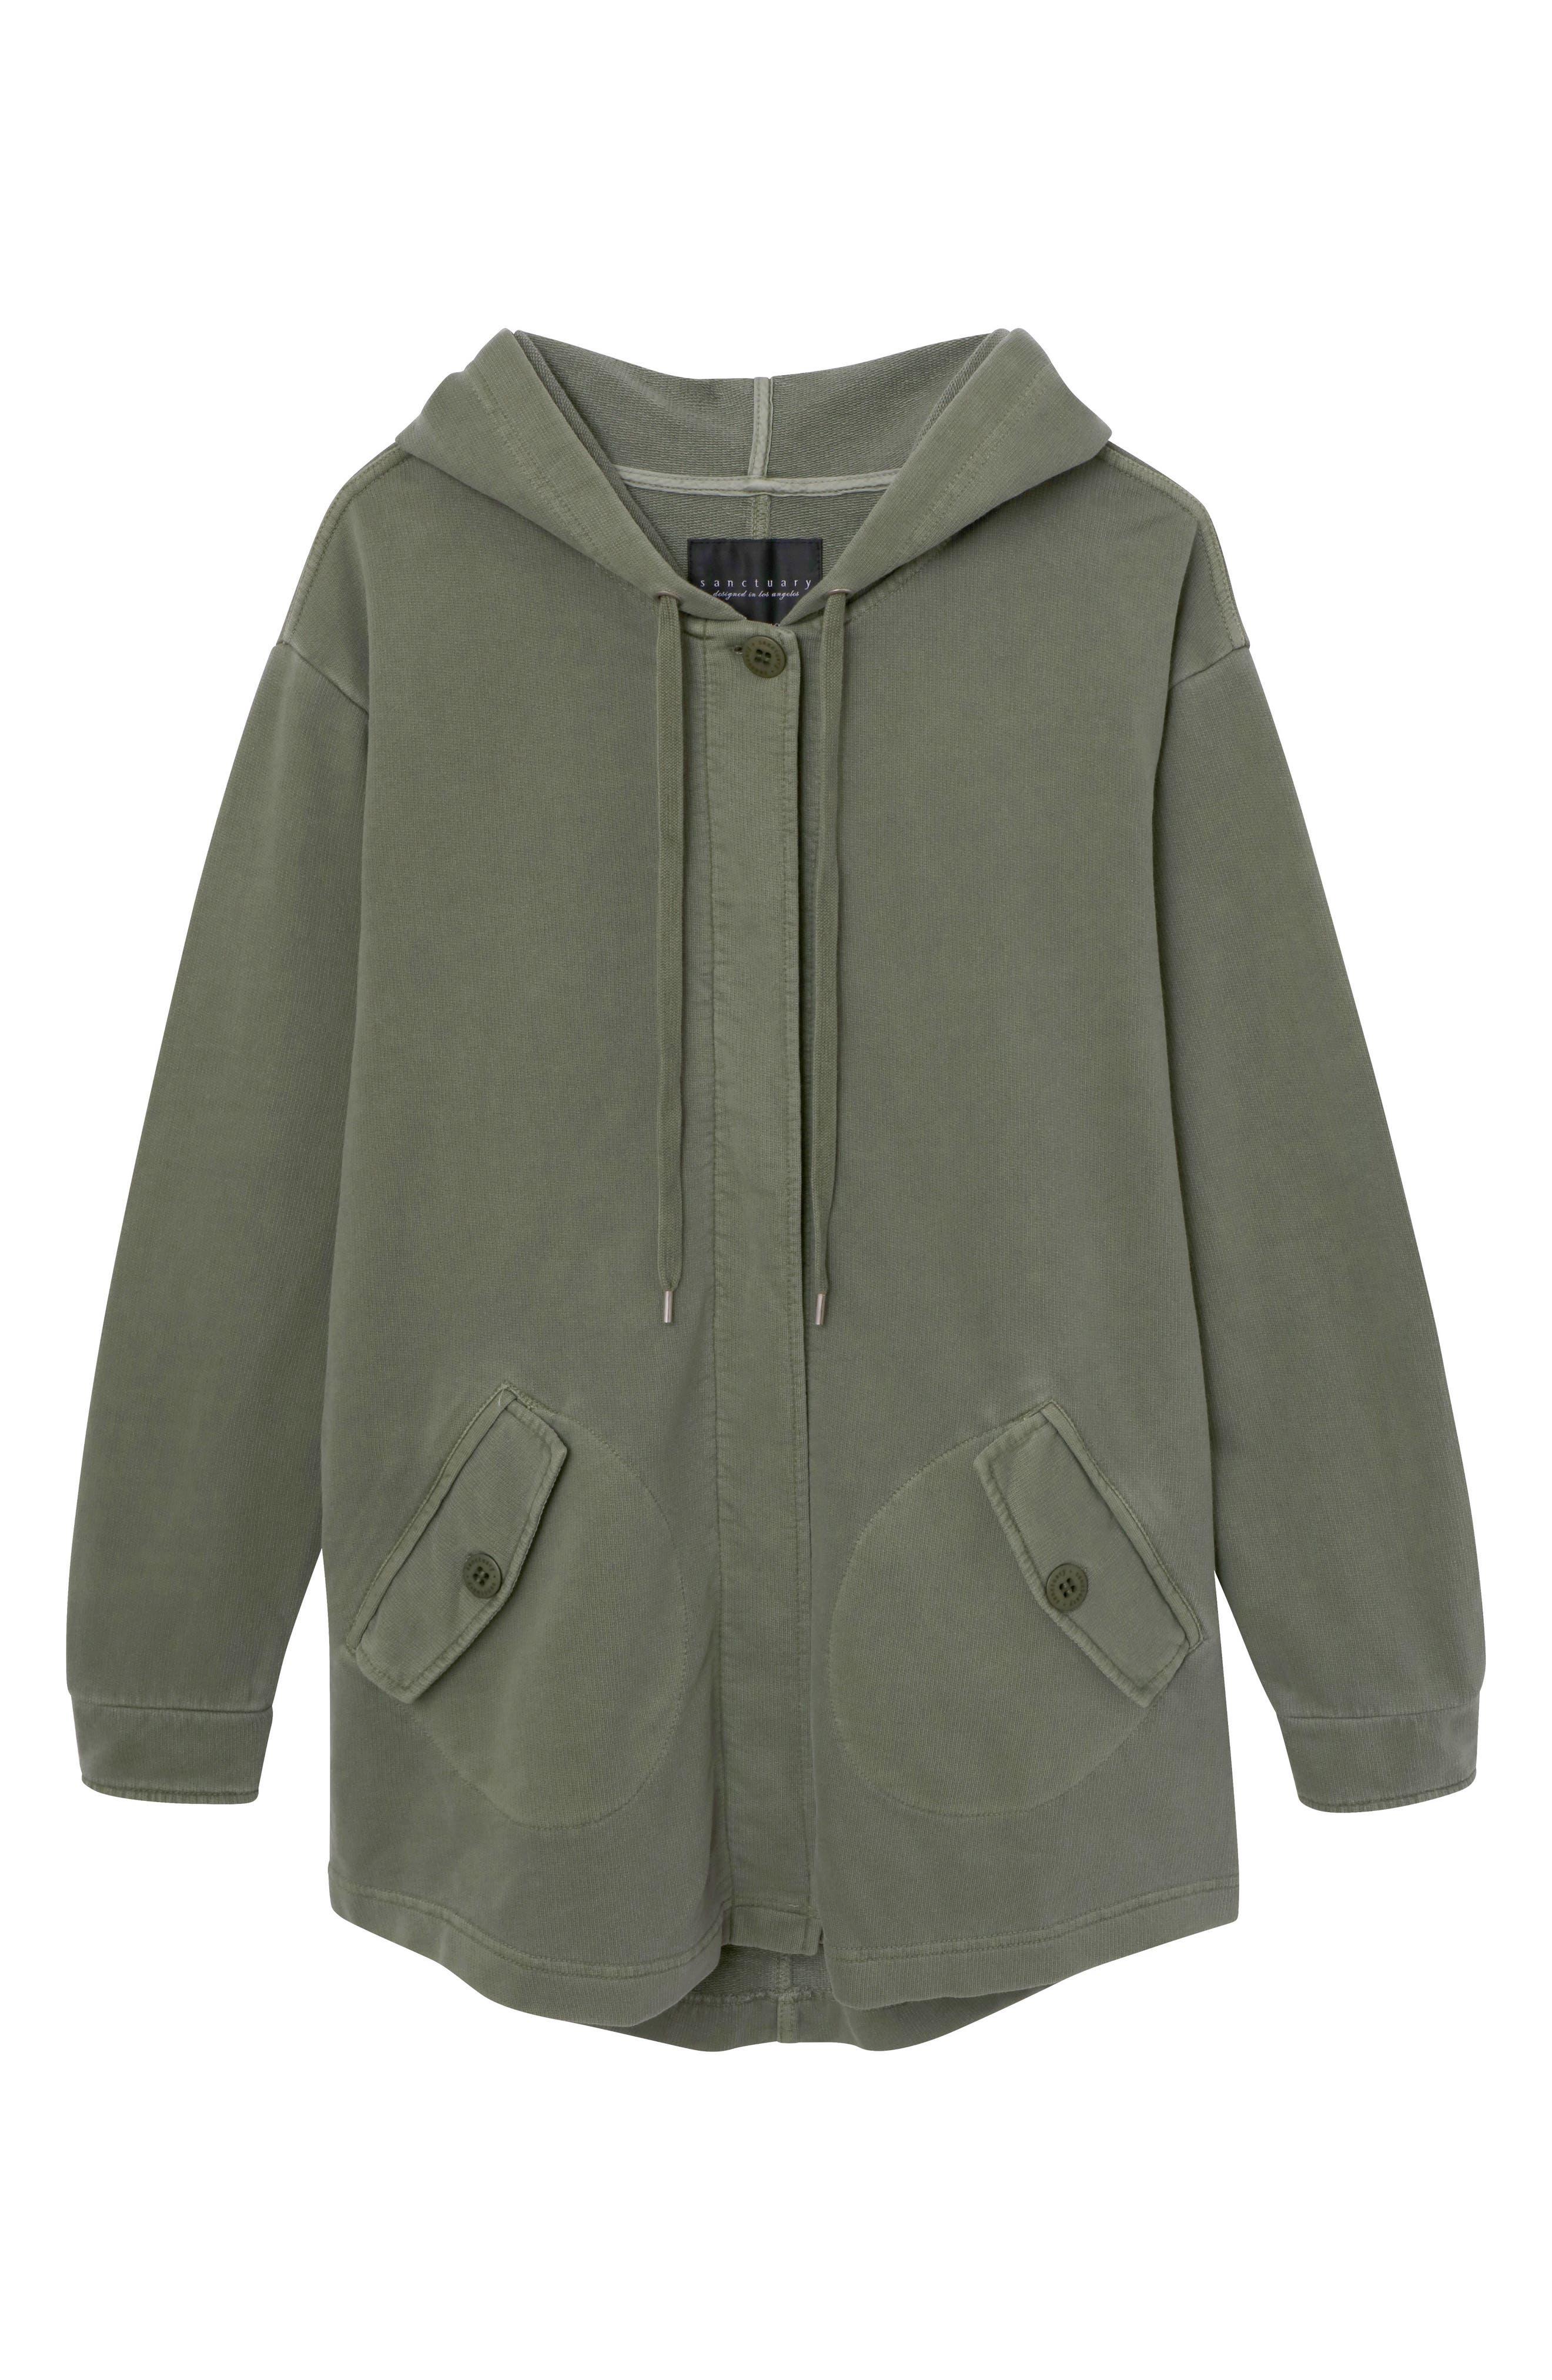 Top Rank Hooded Jacket,                             Alternate thumbnail 3, color,                             300